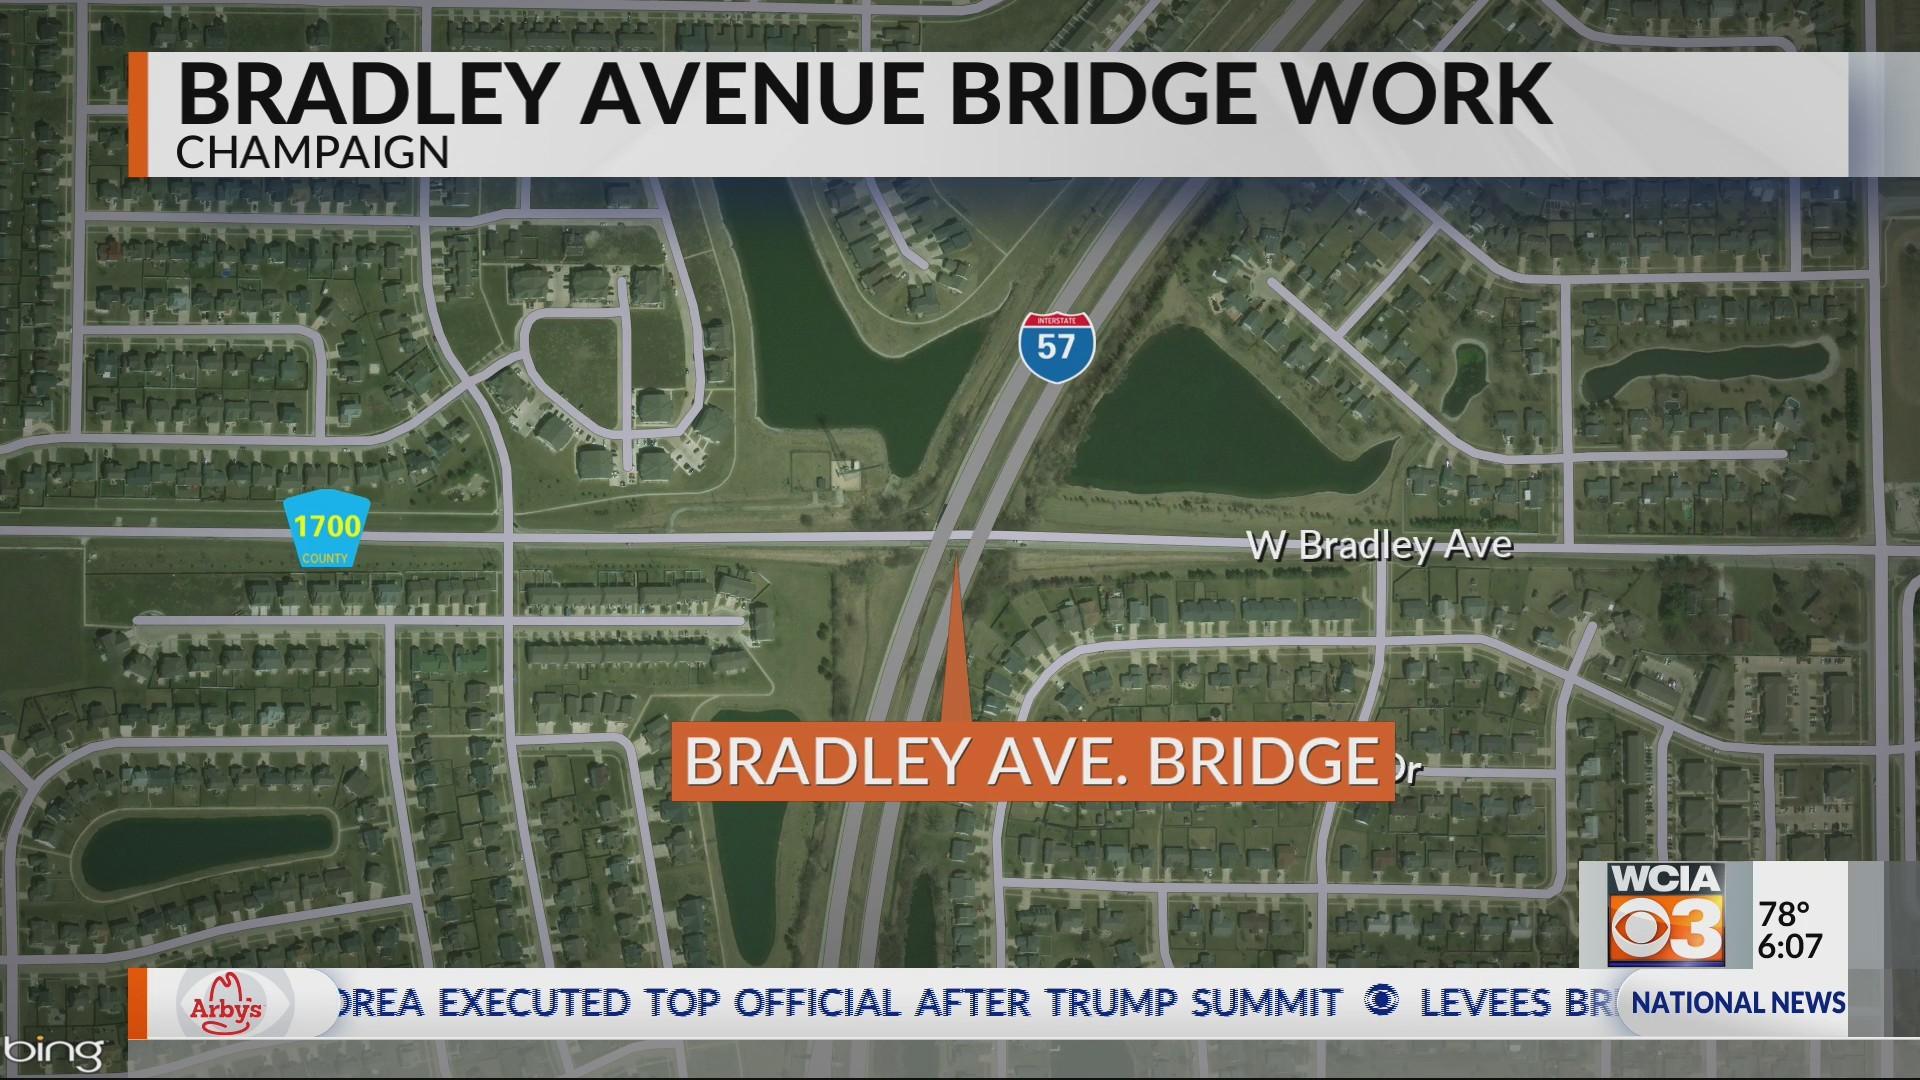 Bradley Avenue bridge work